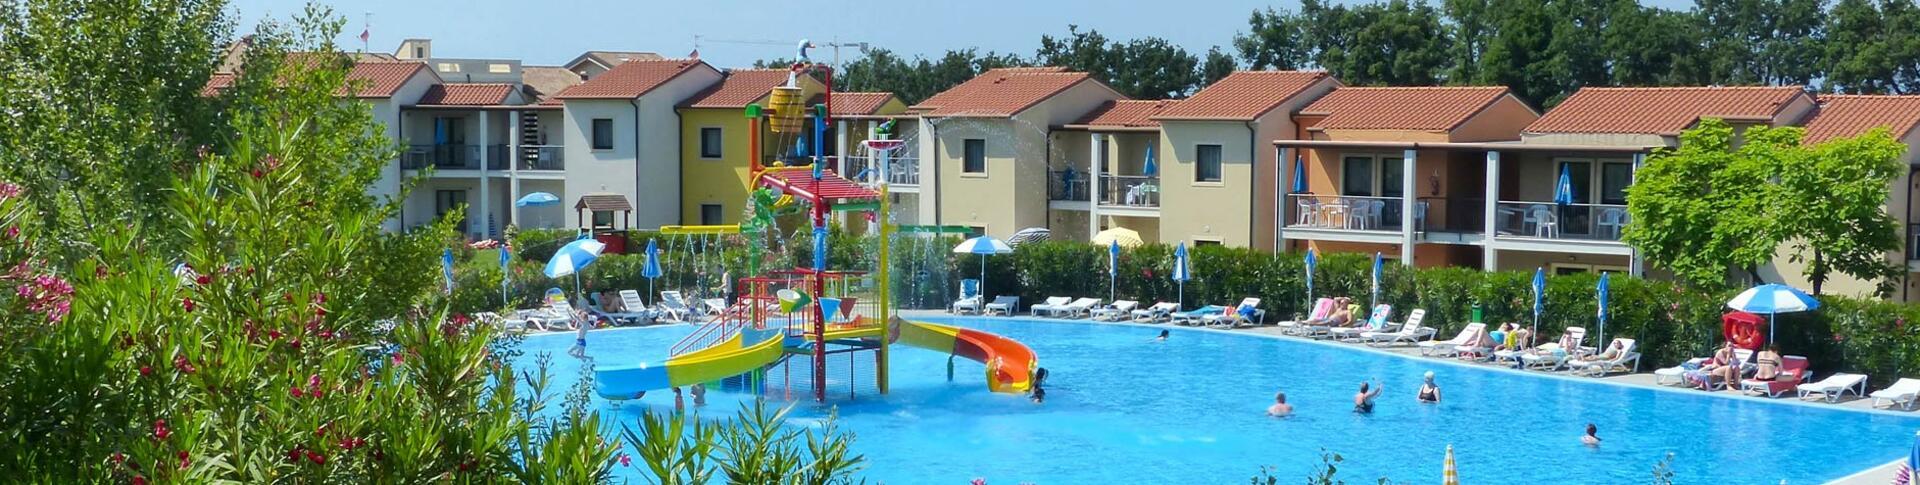 belvederevillage it 1-it-304848-bonus-vacanza-lago-di-garda 003